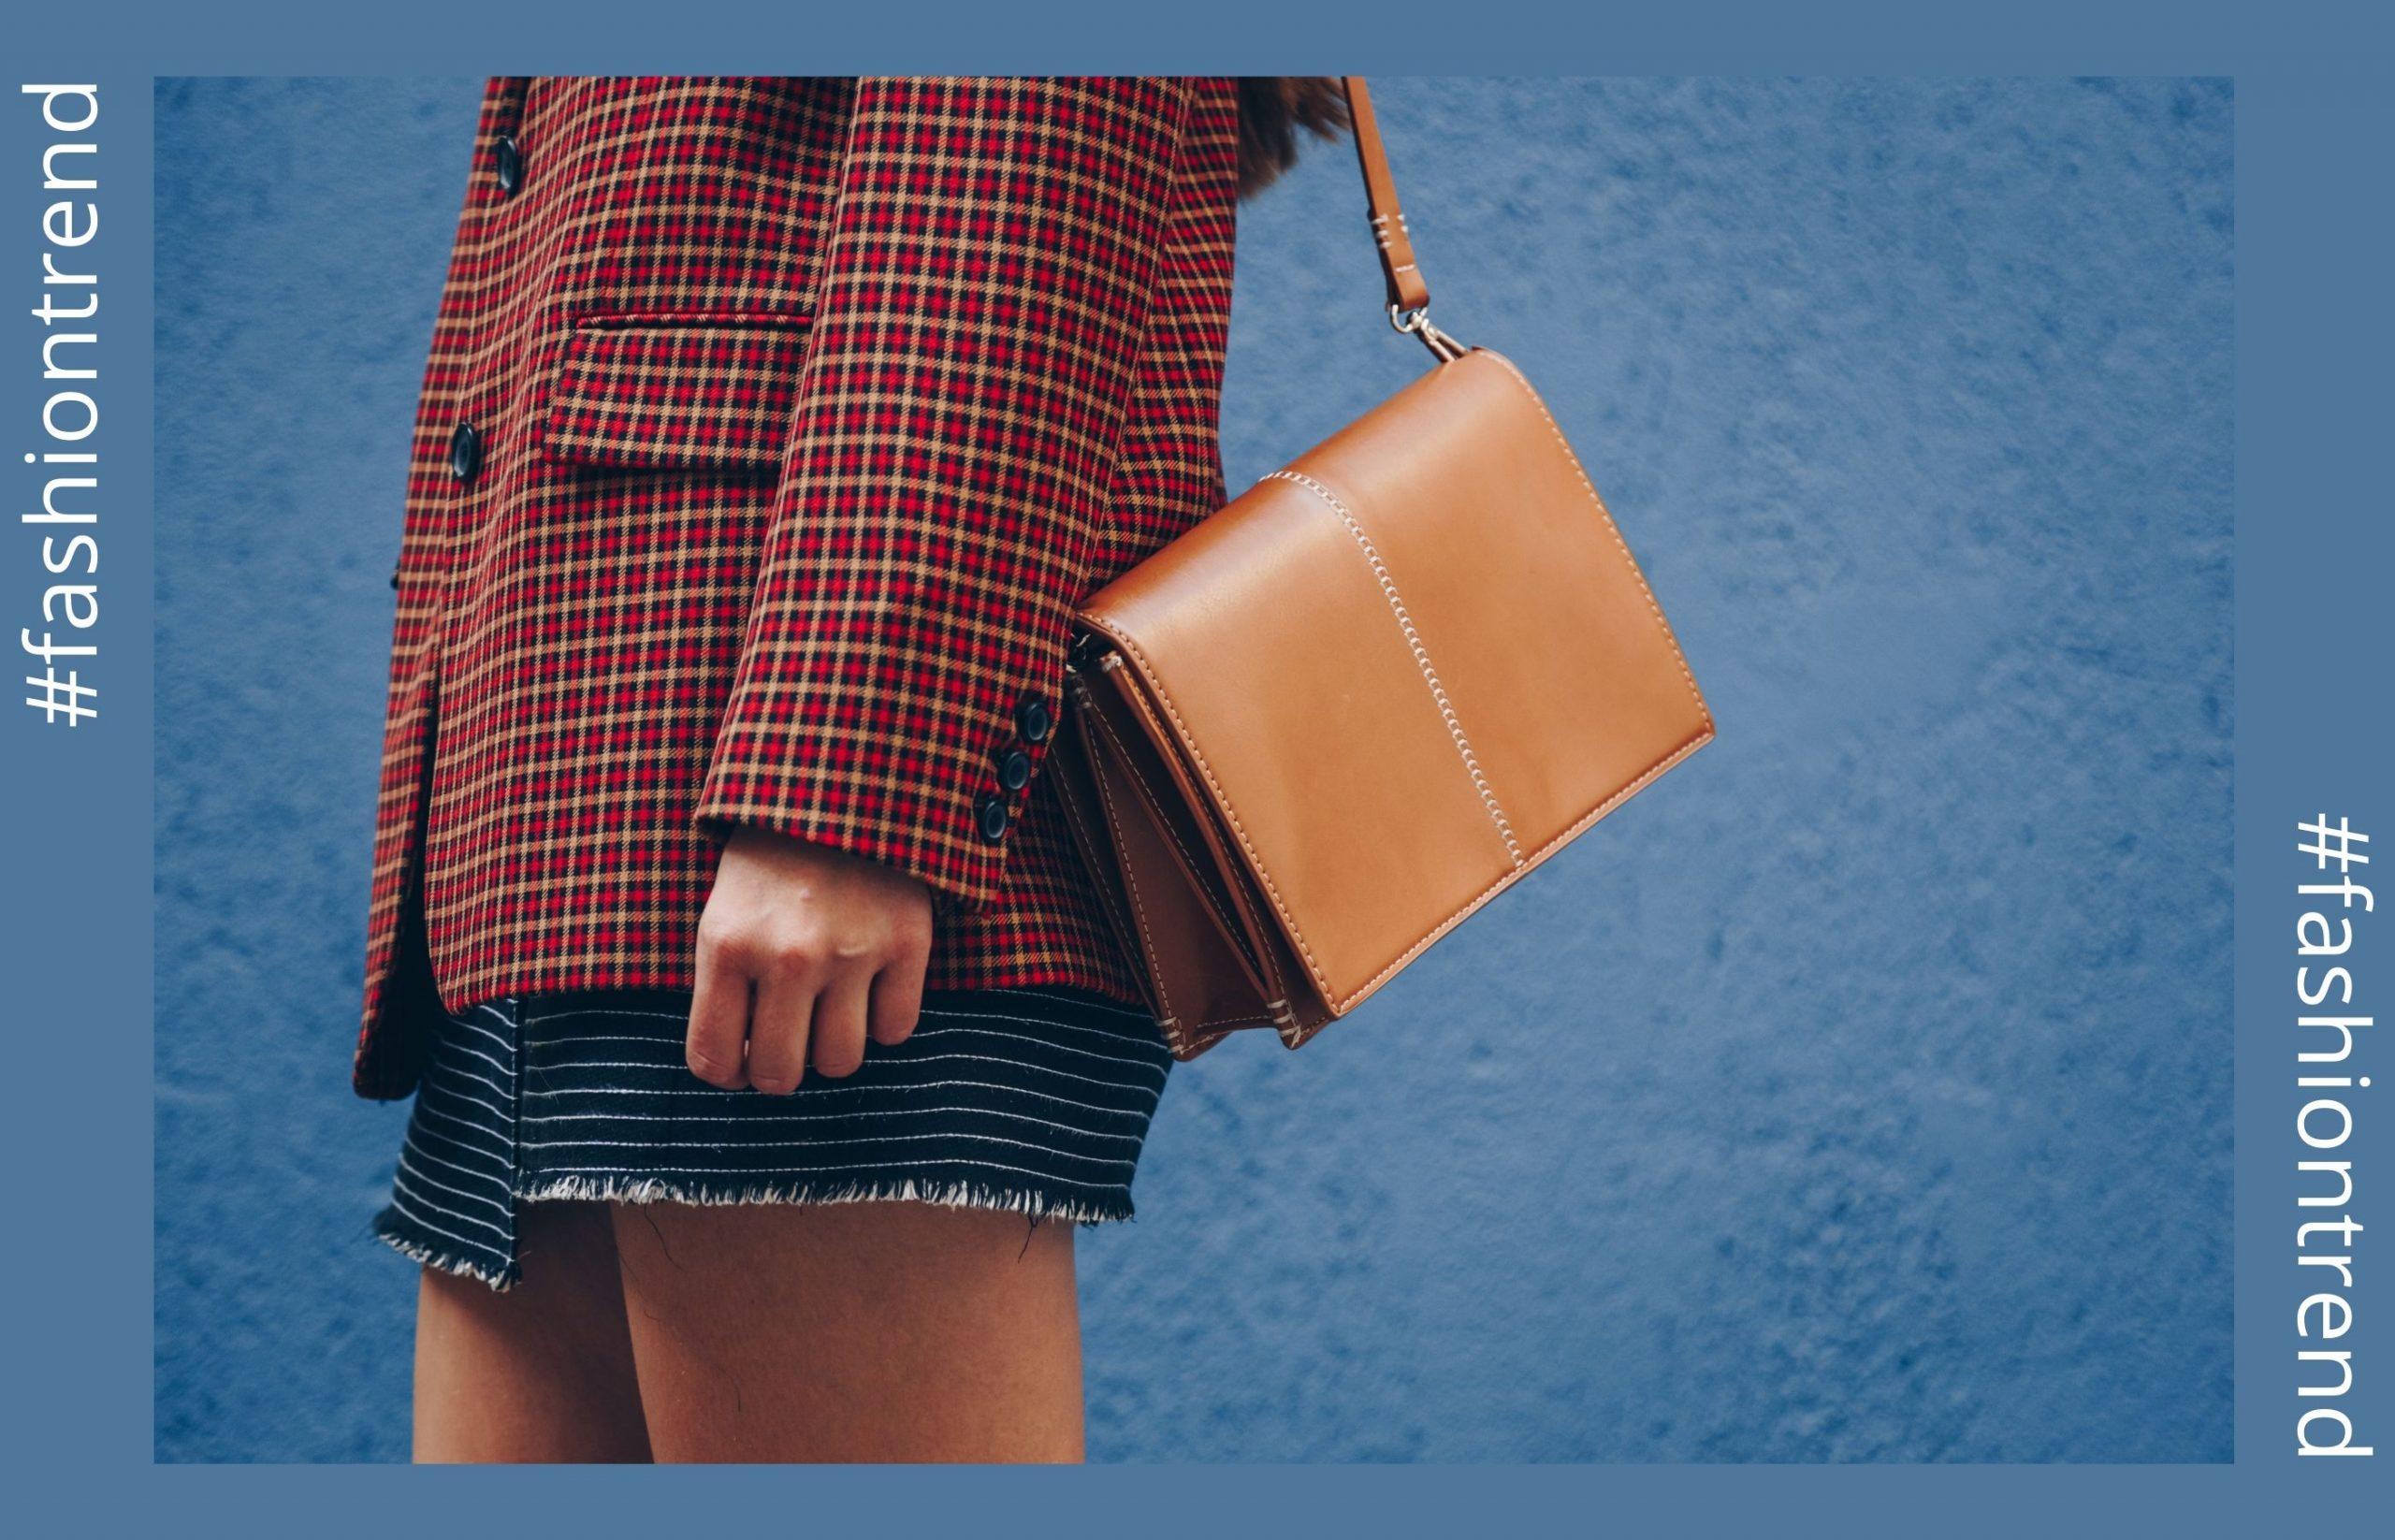 modni trendovi za jesen 2021